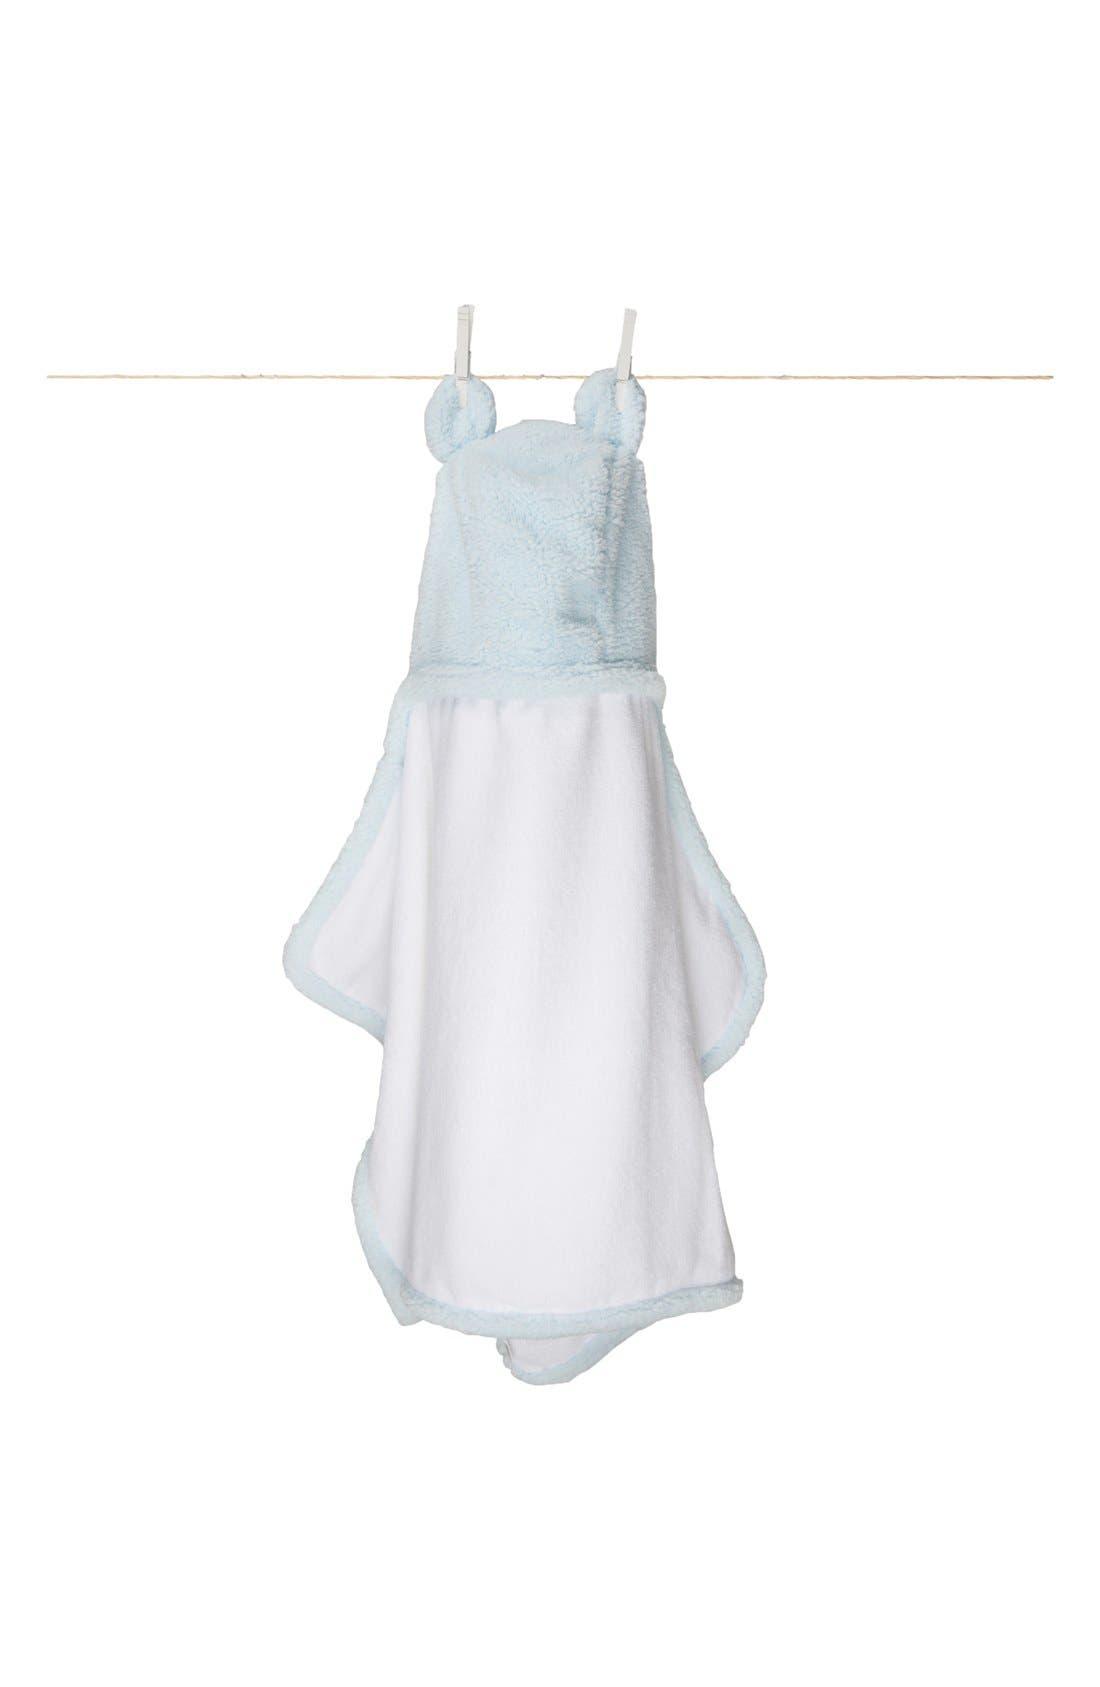 LITTLE GIRAFFE, 'Bella<sup>™</sup>' Towel, Main thumbnail 1, color, 450